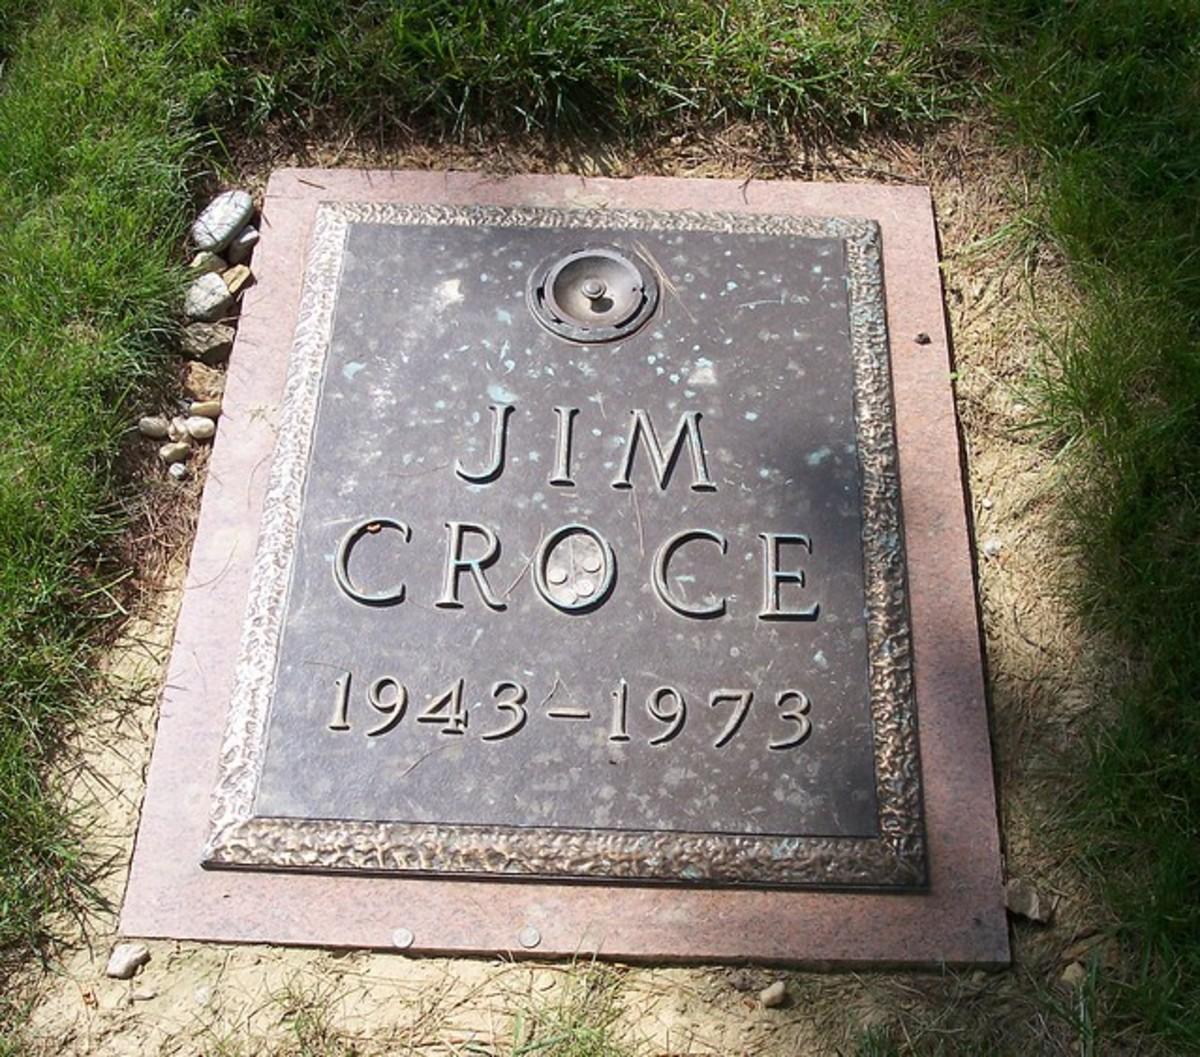 Jim Croce grave marker